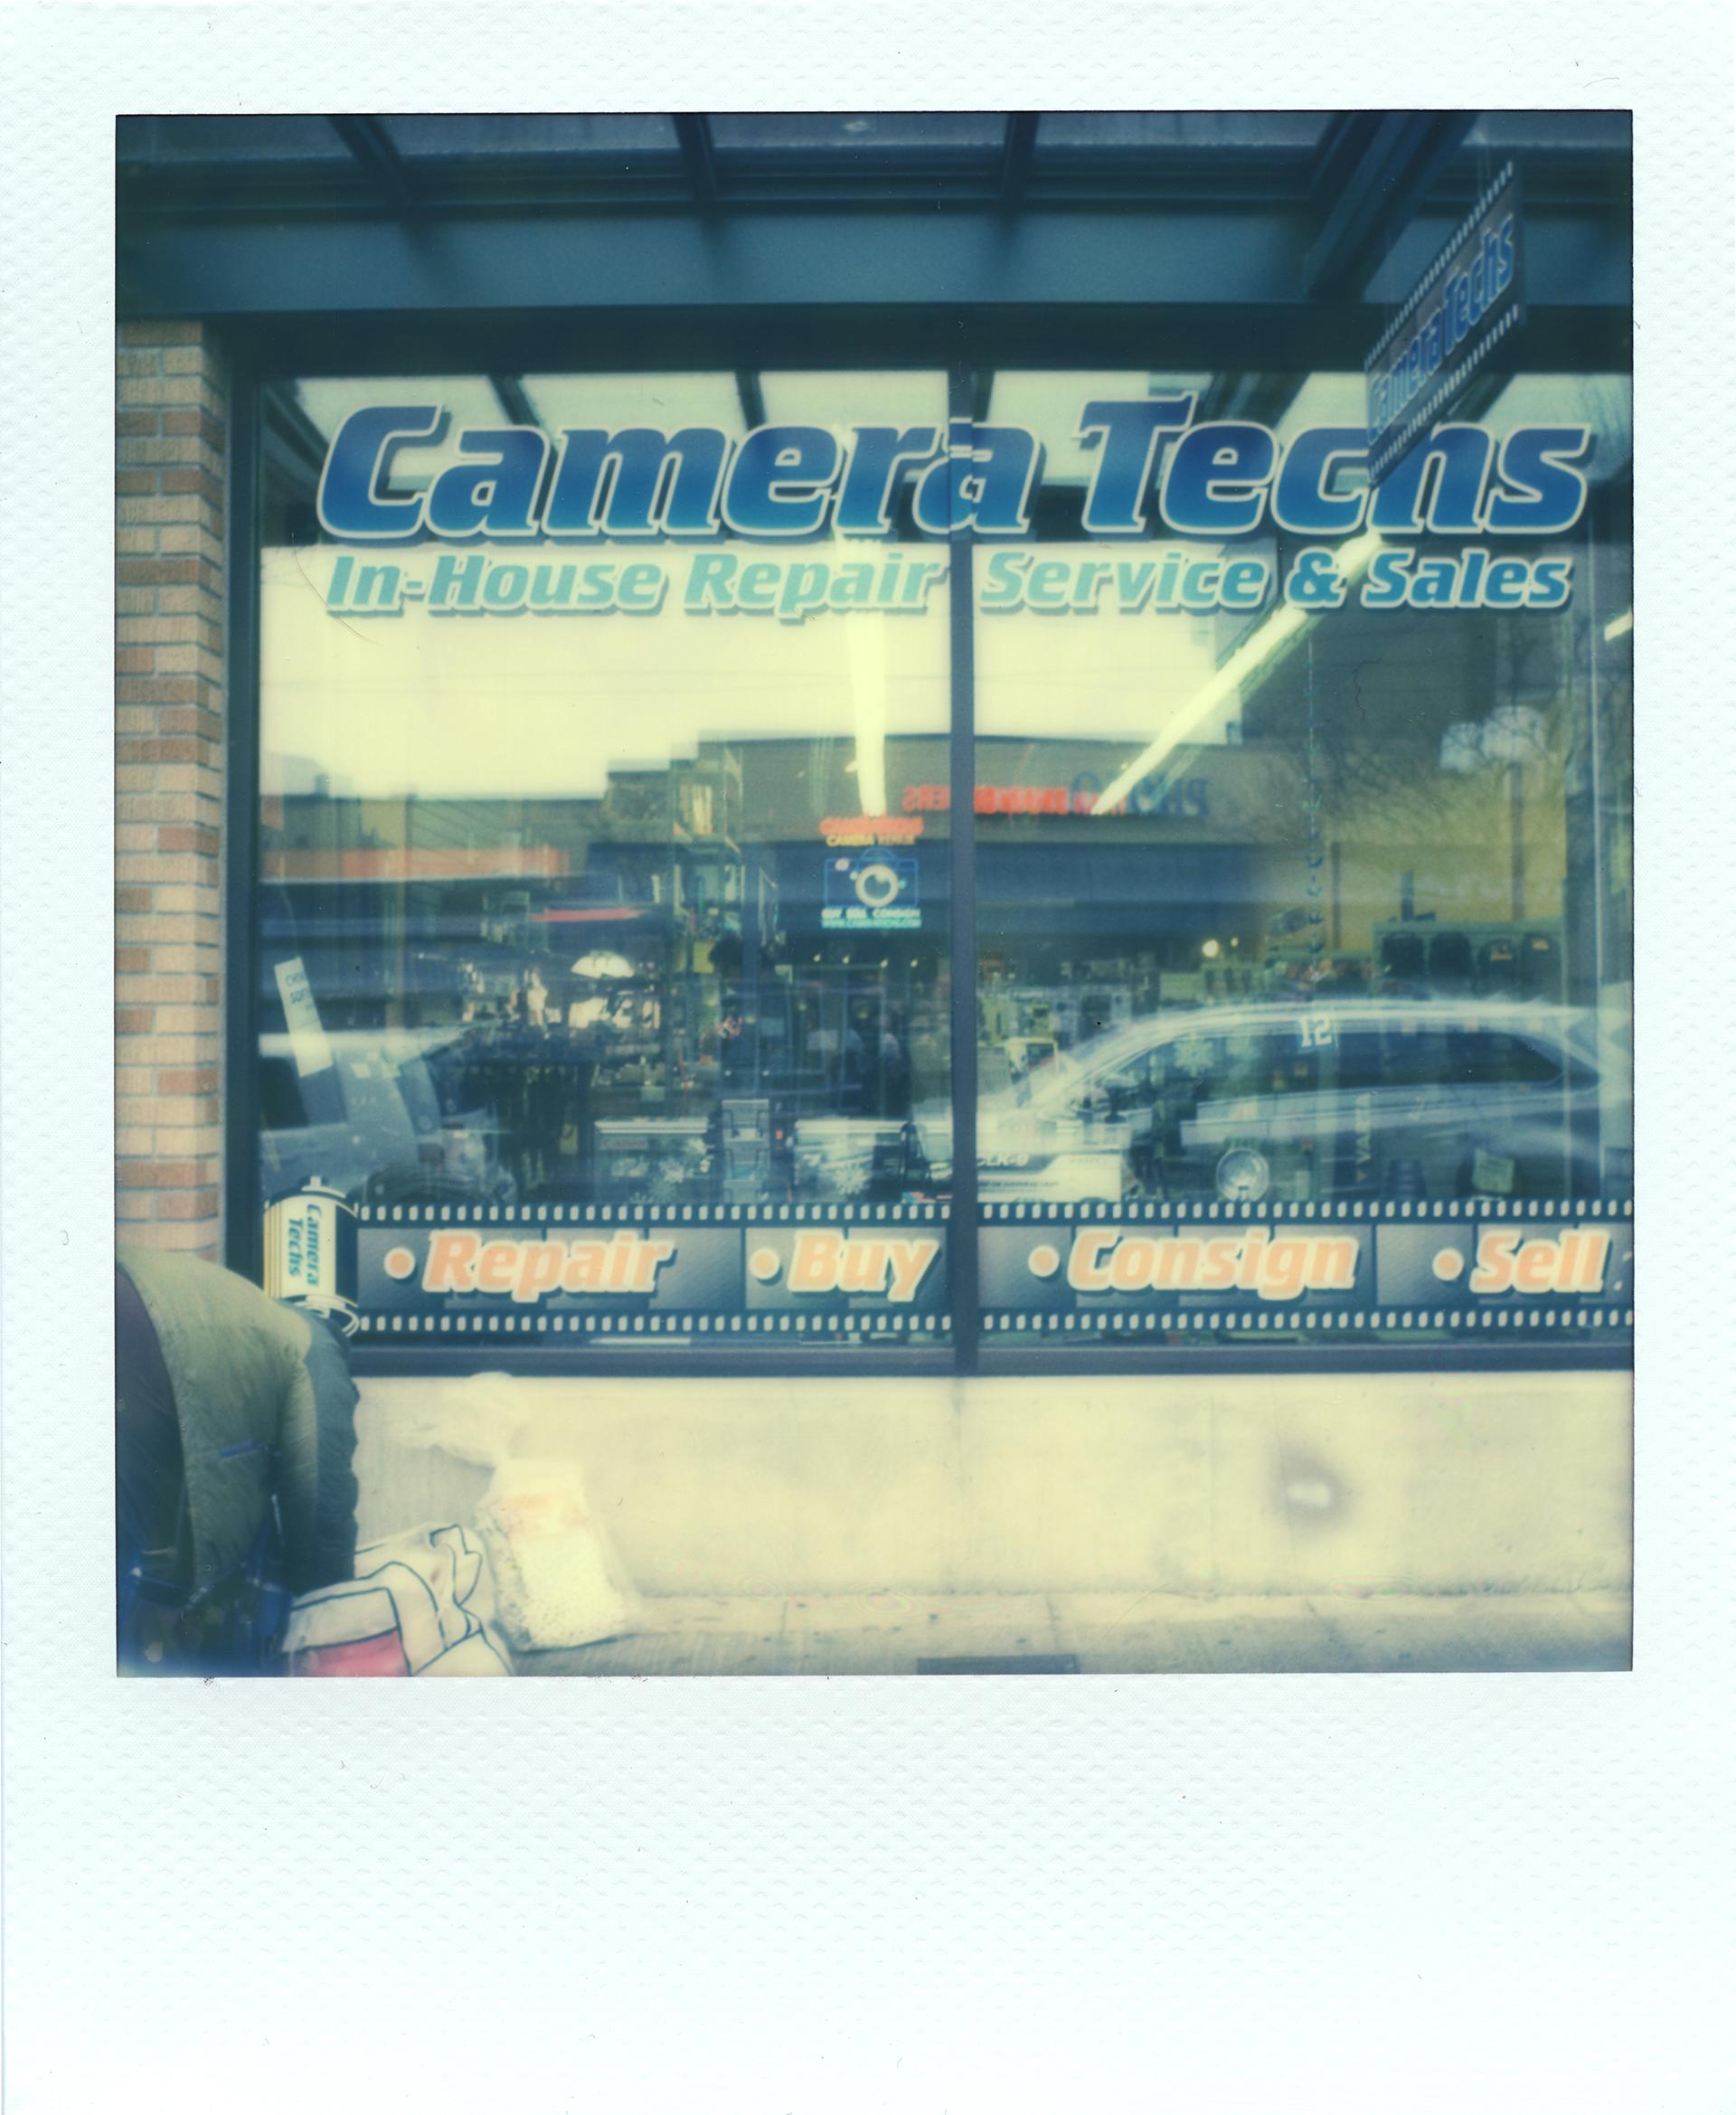 Camera_CameraTechs.jpg